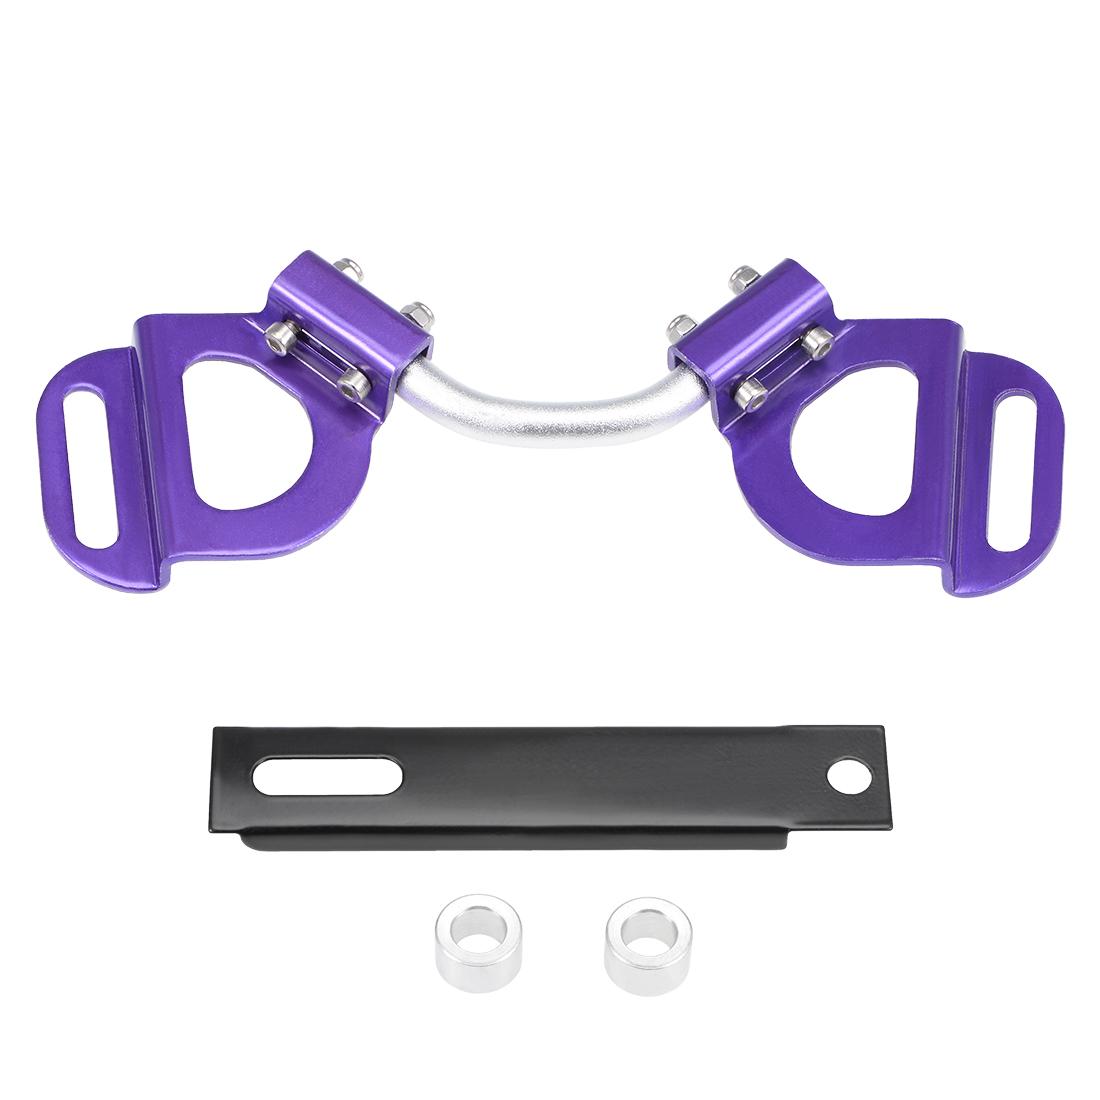 Car Battery Hold Down Bracket Aluminum Adjustable Holder, Purple